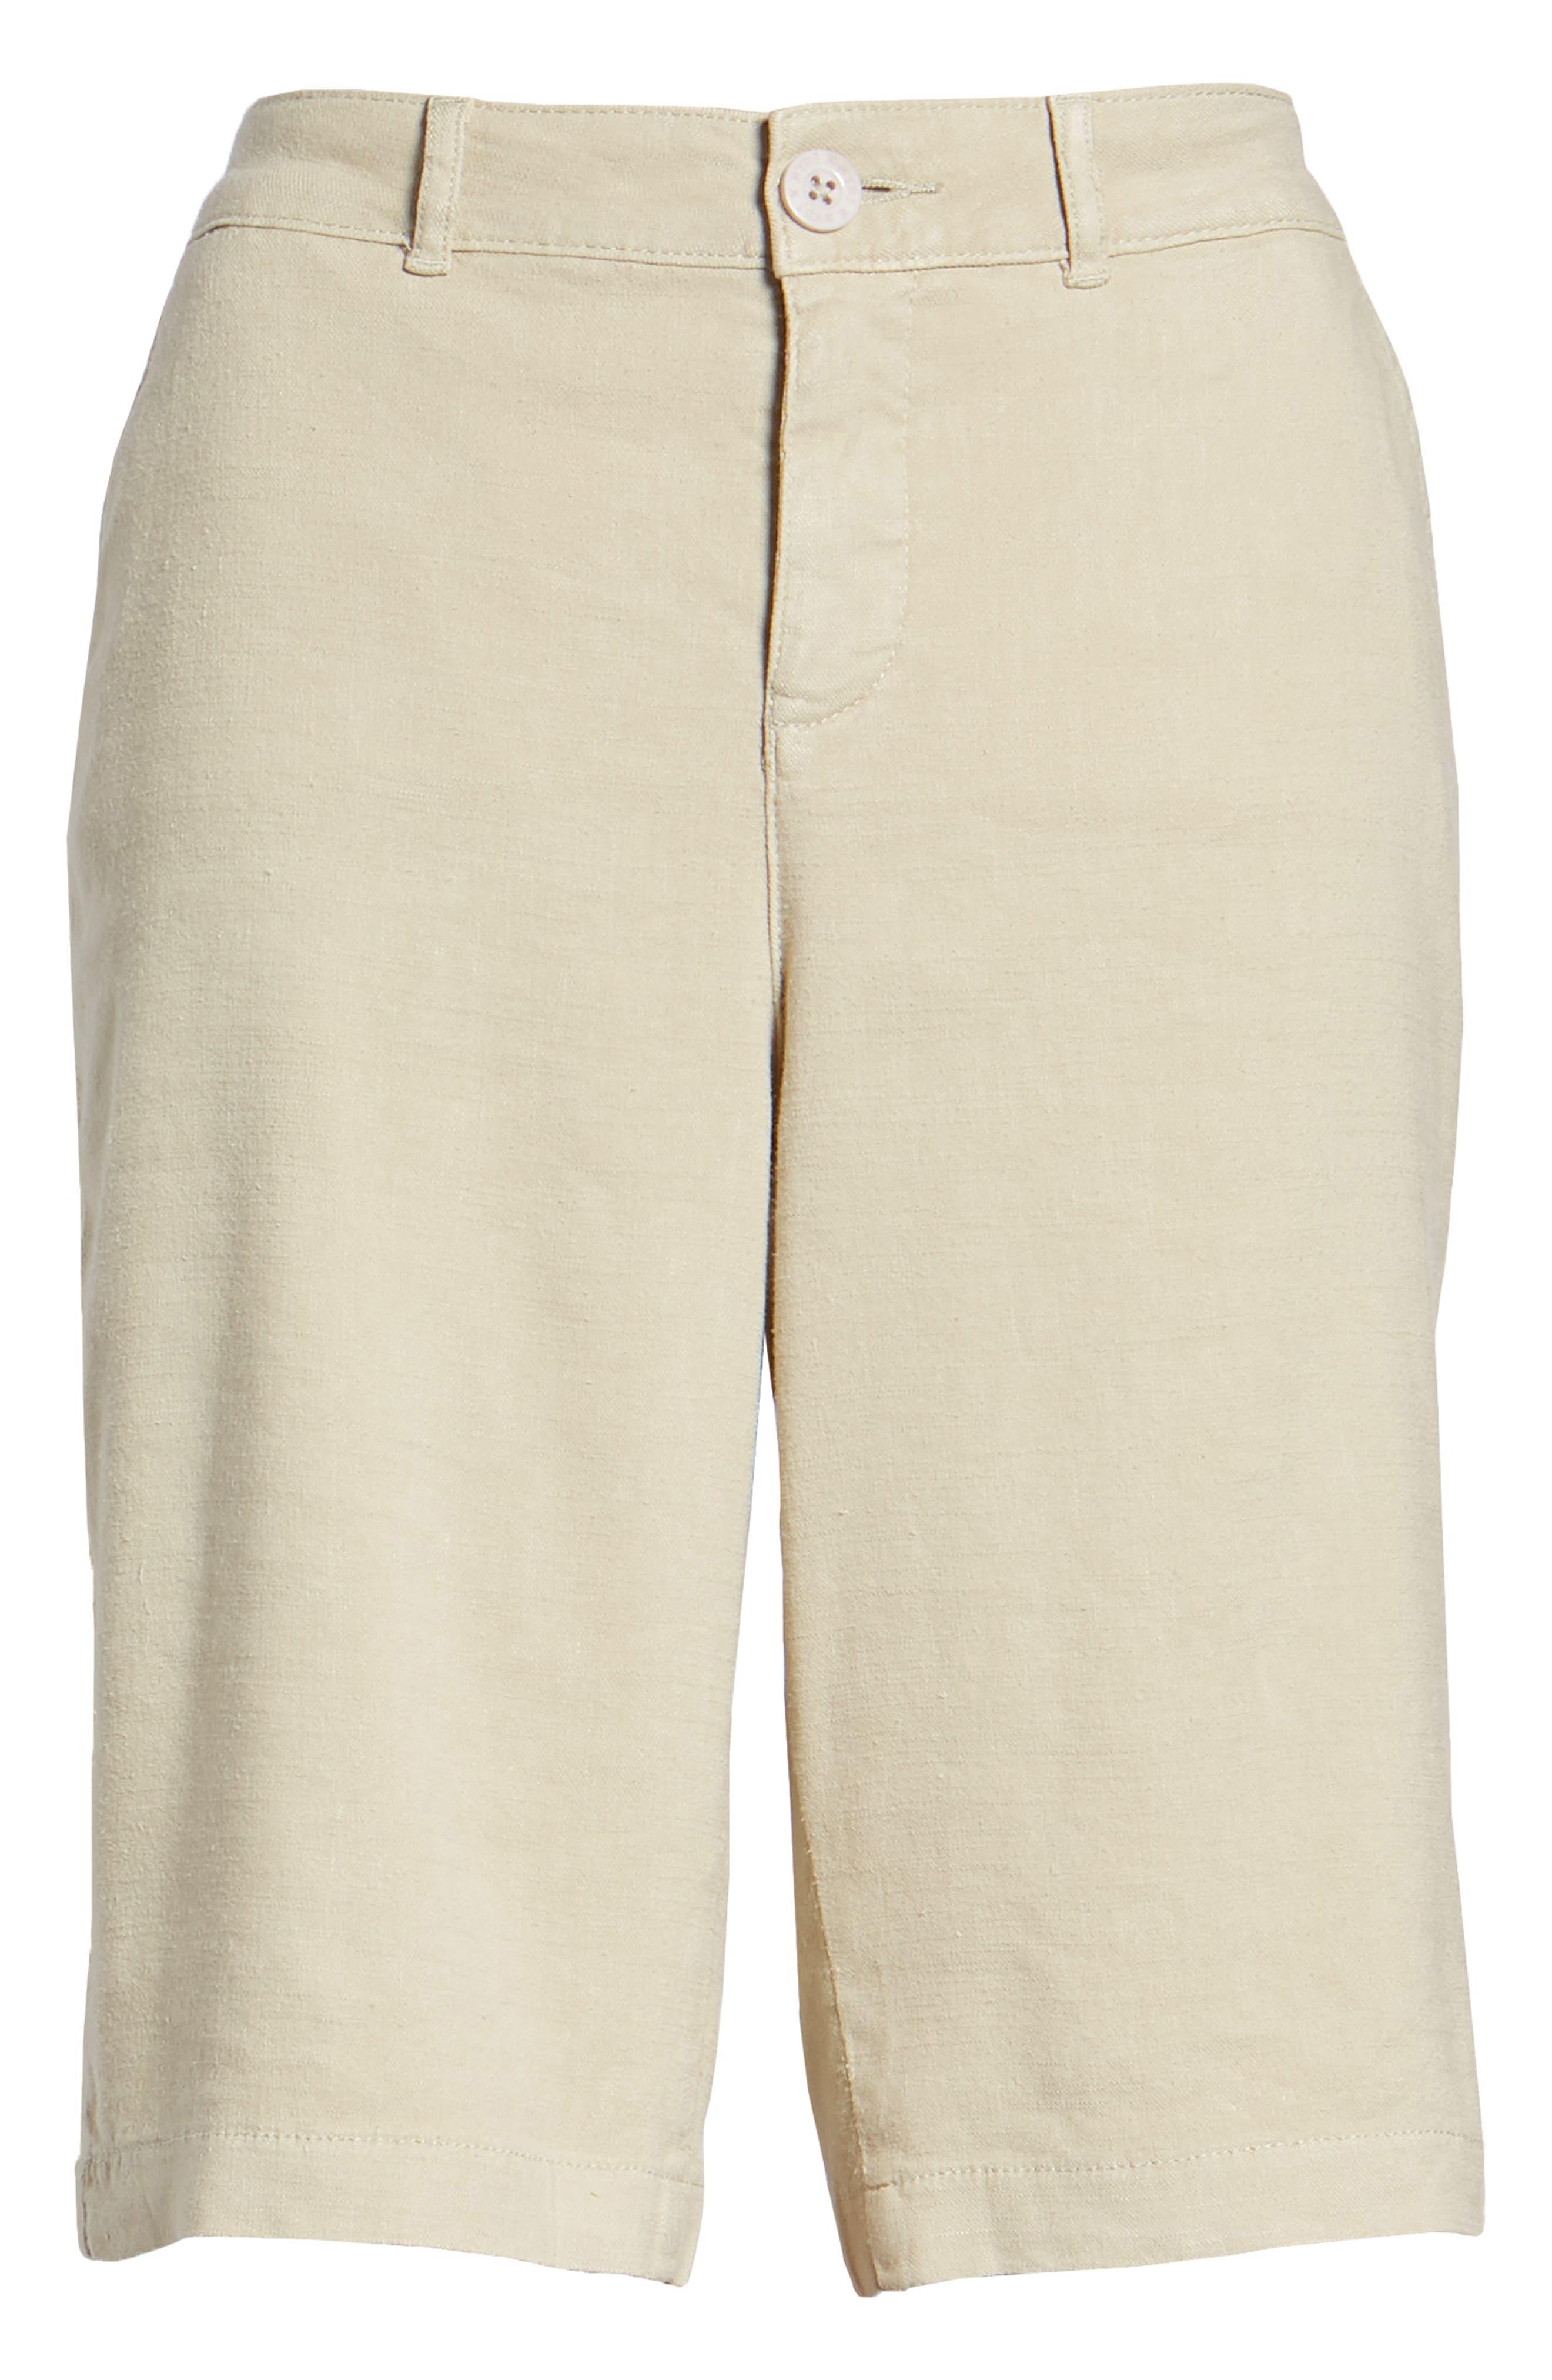 Stretch Linen Blend Bermuda Shorts,                             Alternate thumbnail 17, color,